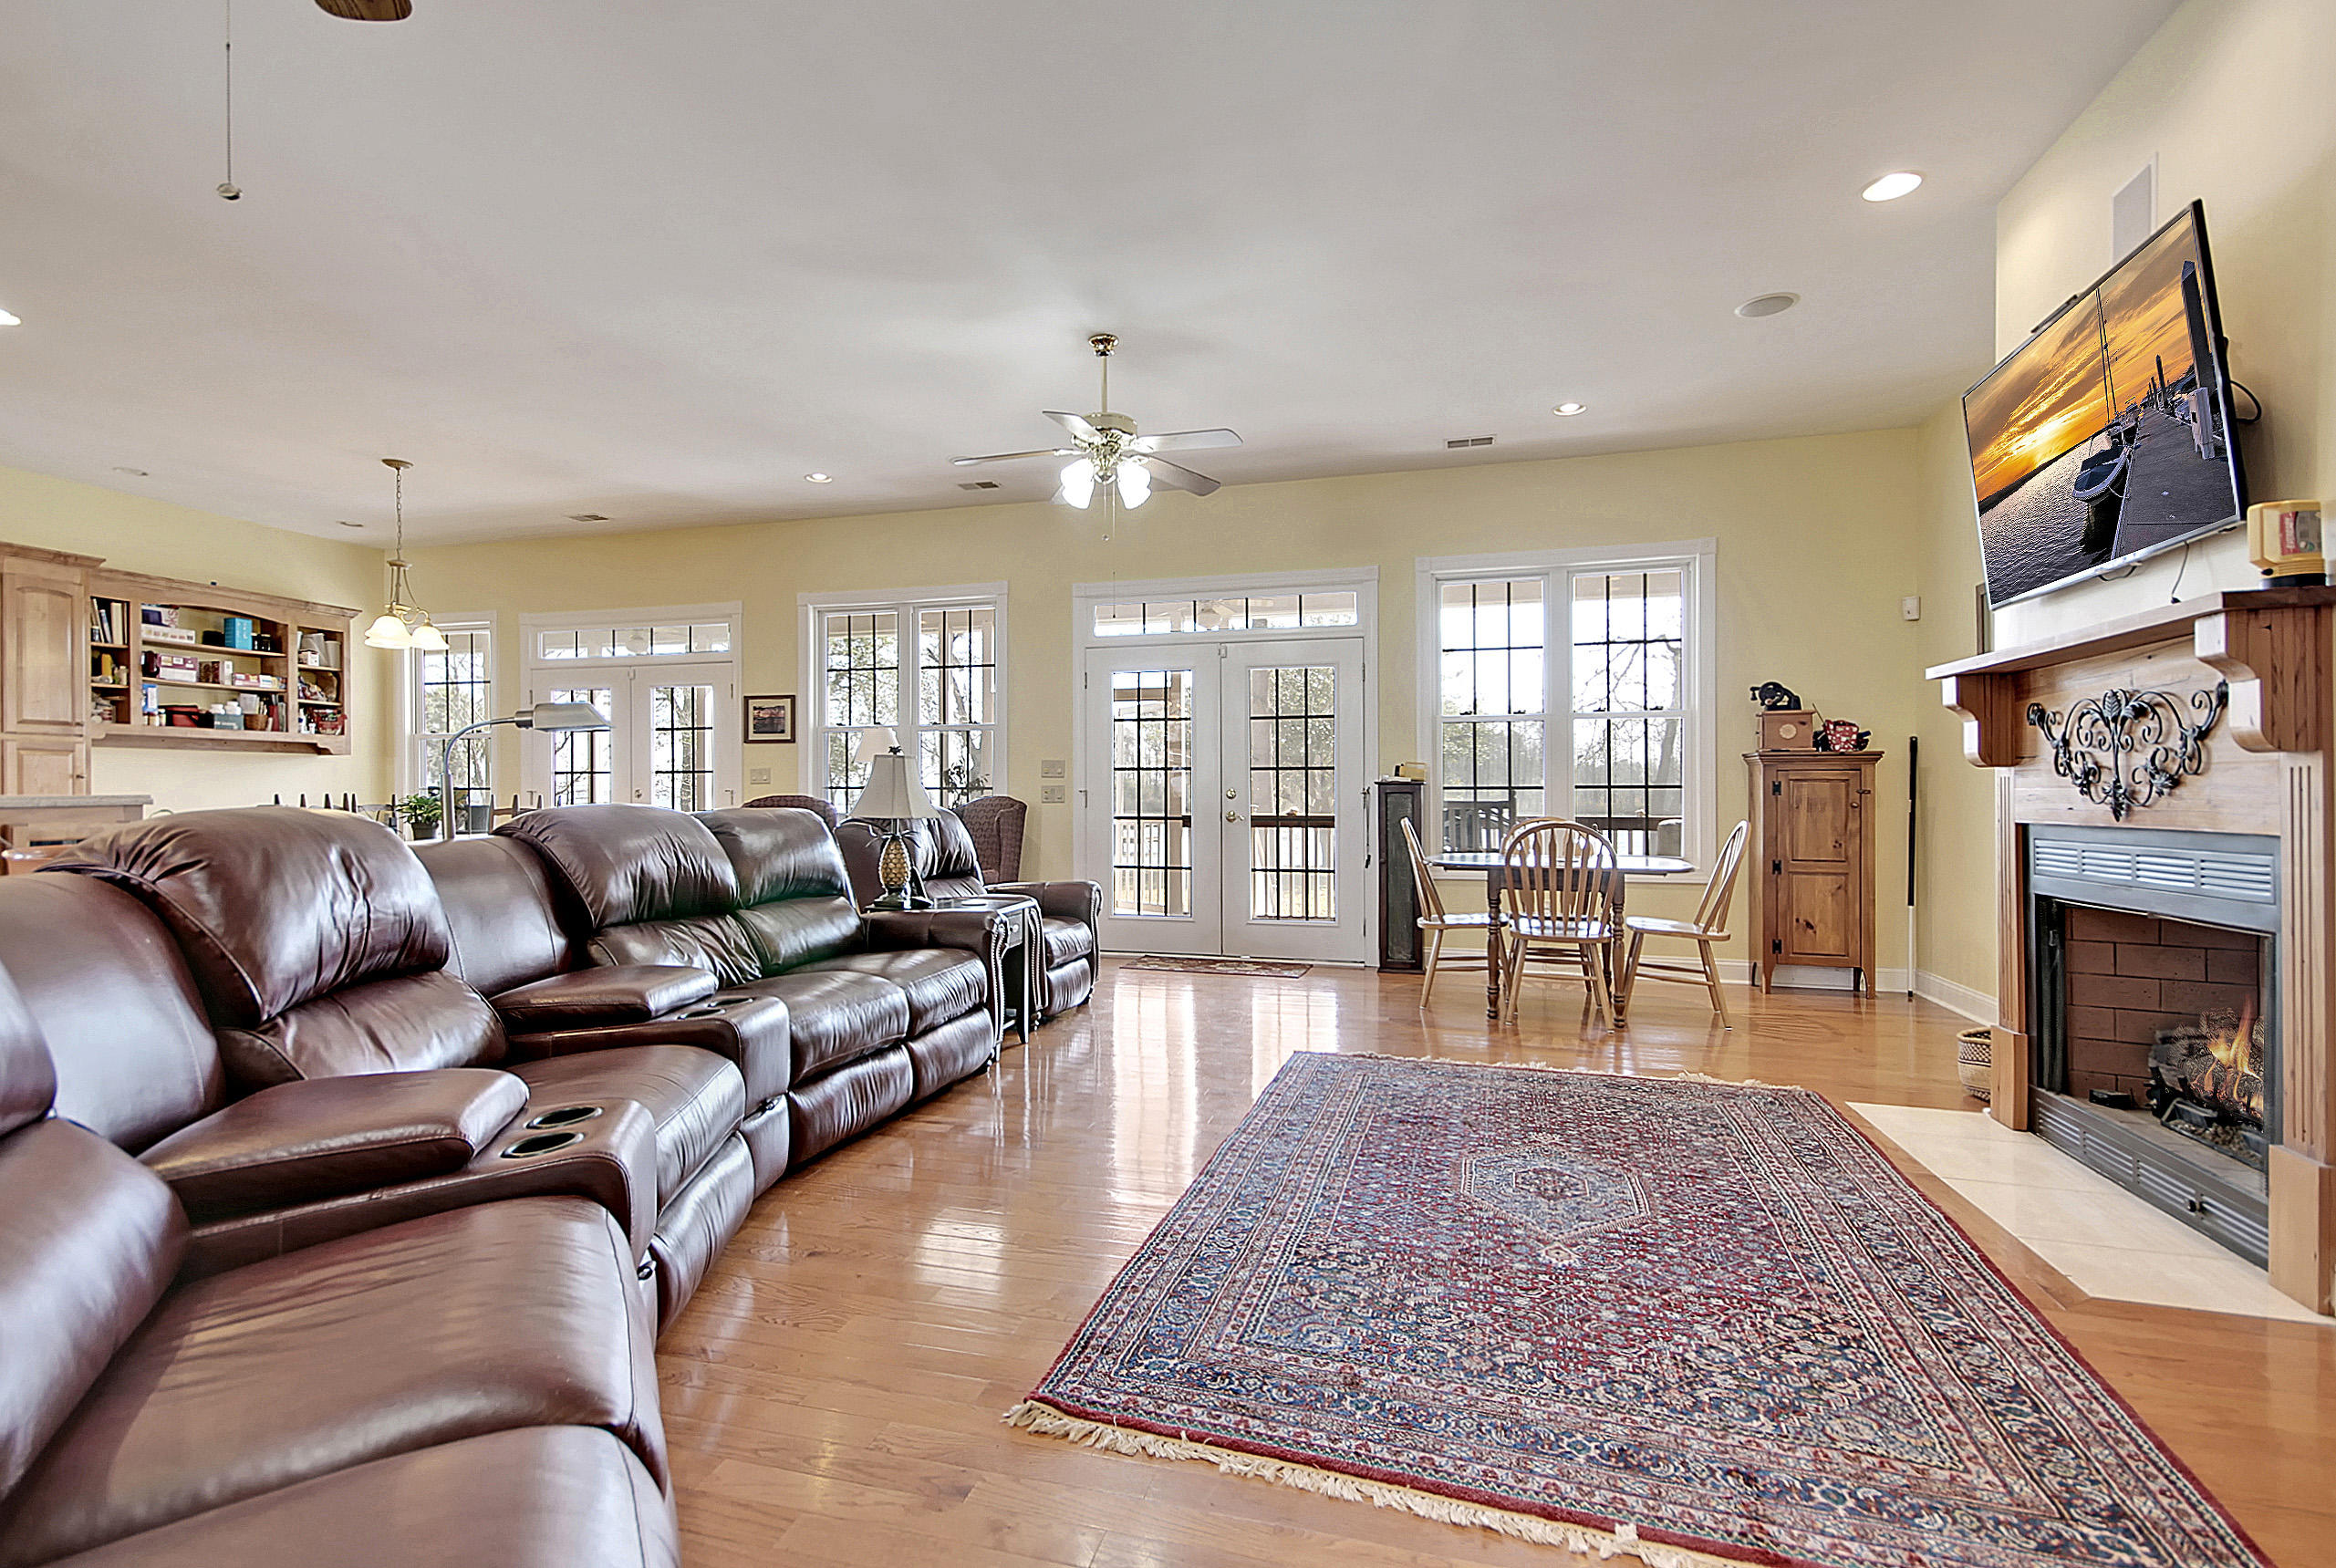 Cross Subd (Longpoint) Homes For Sale - 1191 Longpoint, Cross, SC - 30